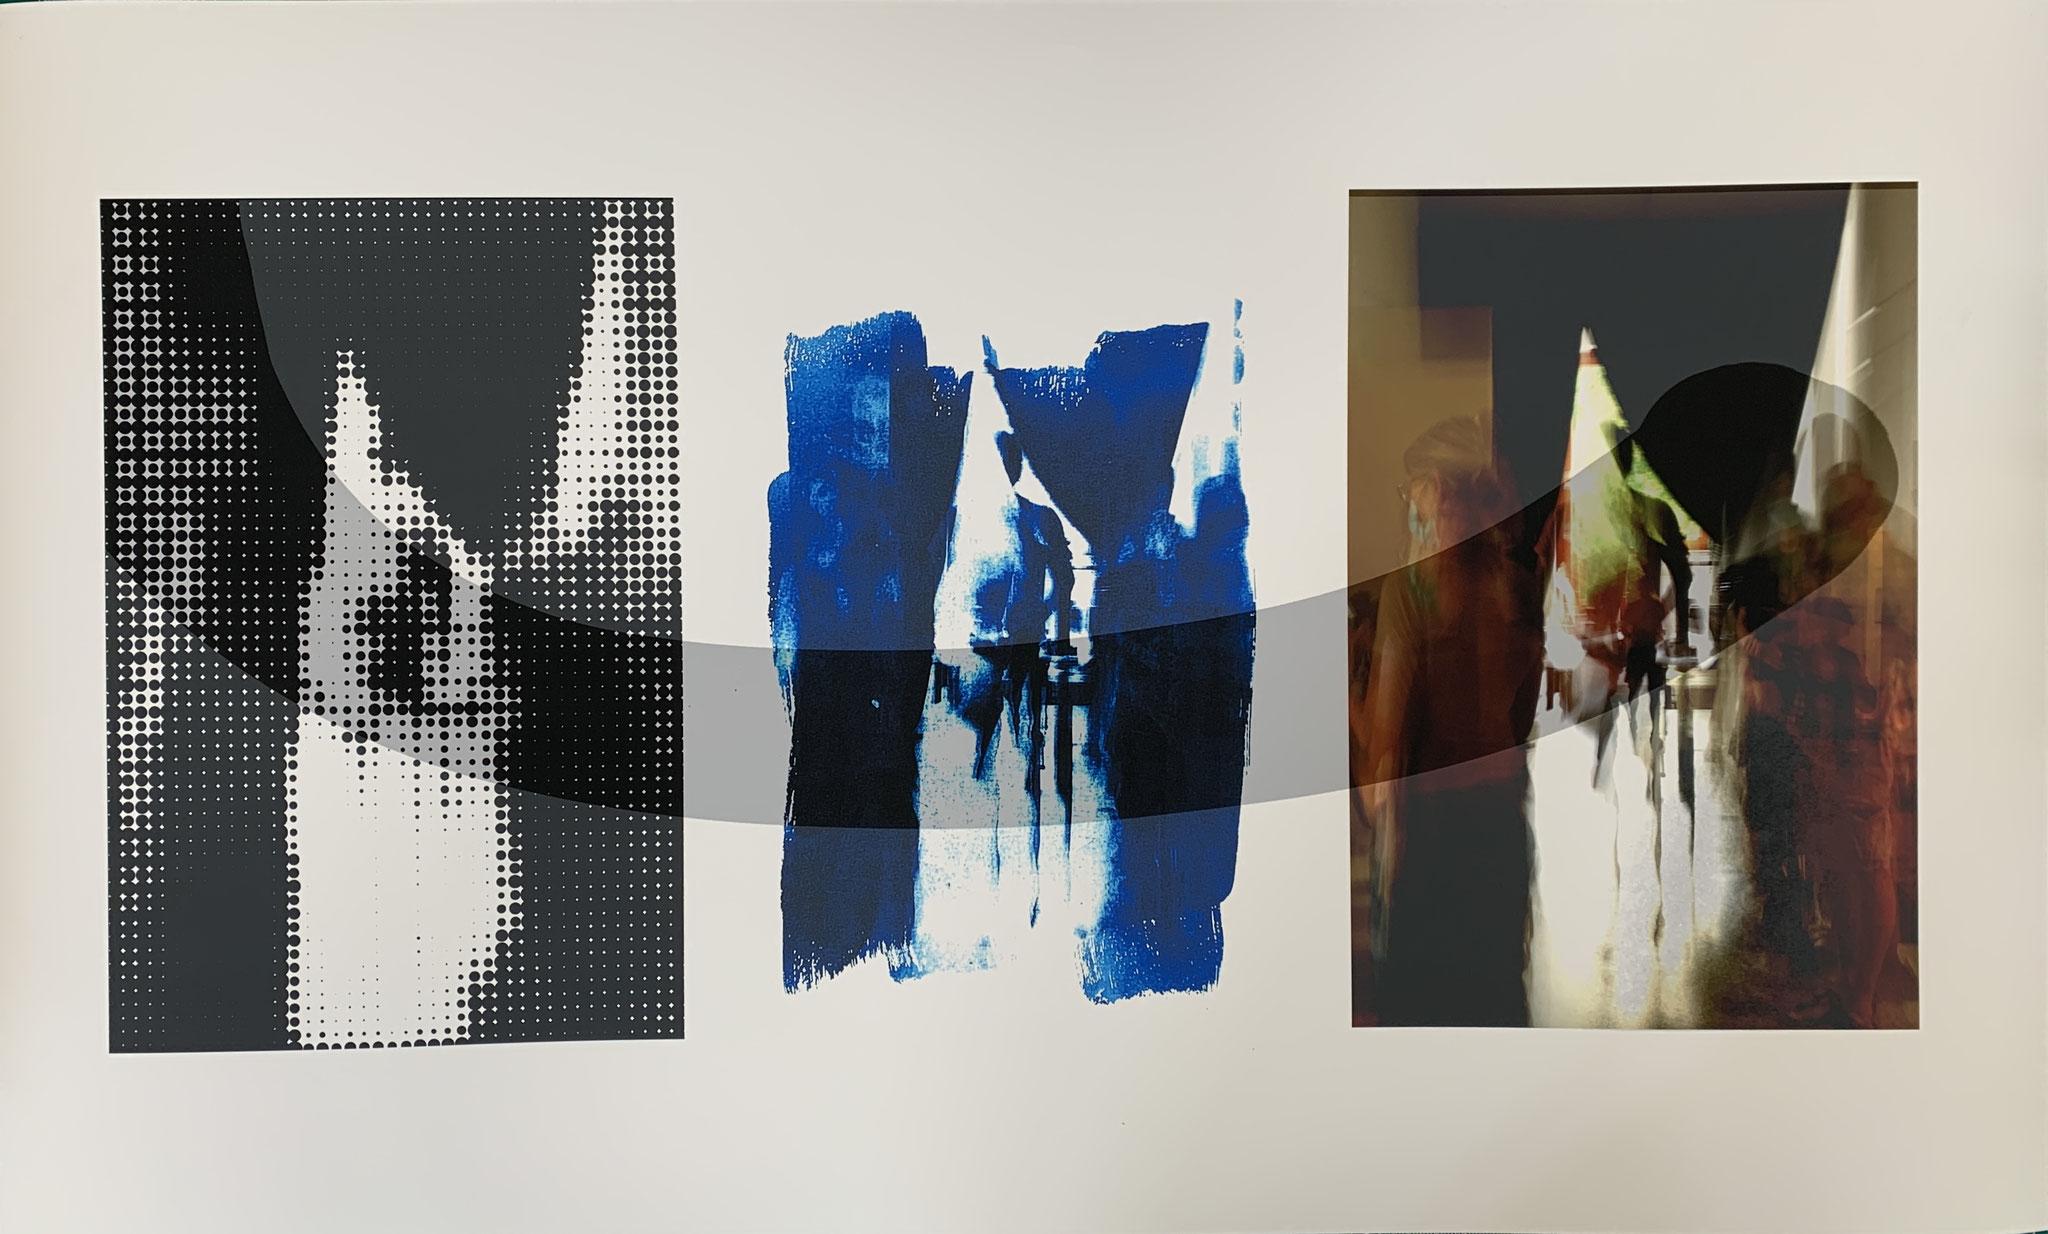 Fließende Bindung, Print, 35 x 75 cm, 2020